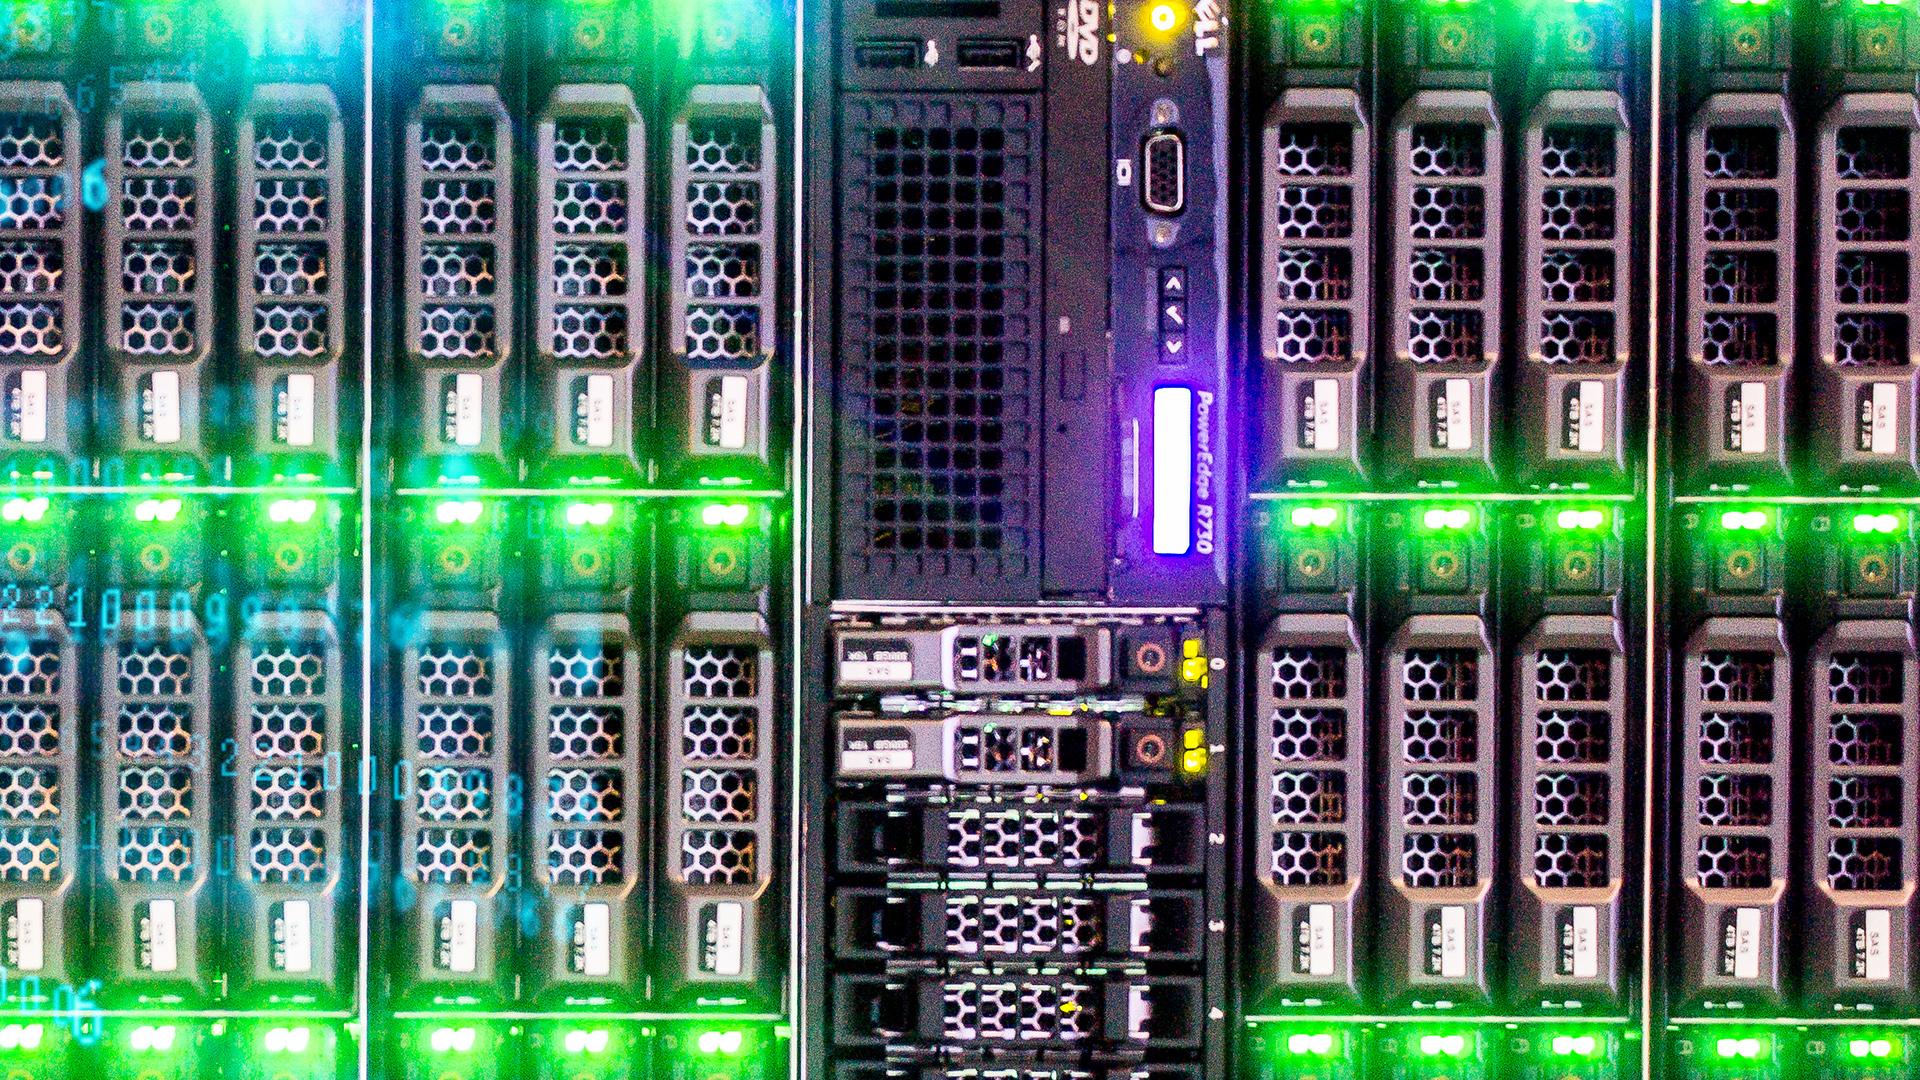 Obliczenia superkomputerowe